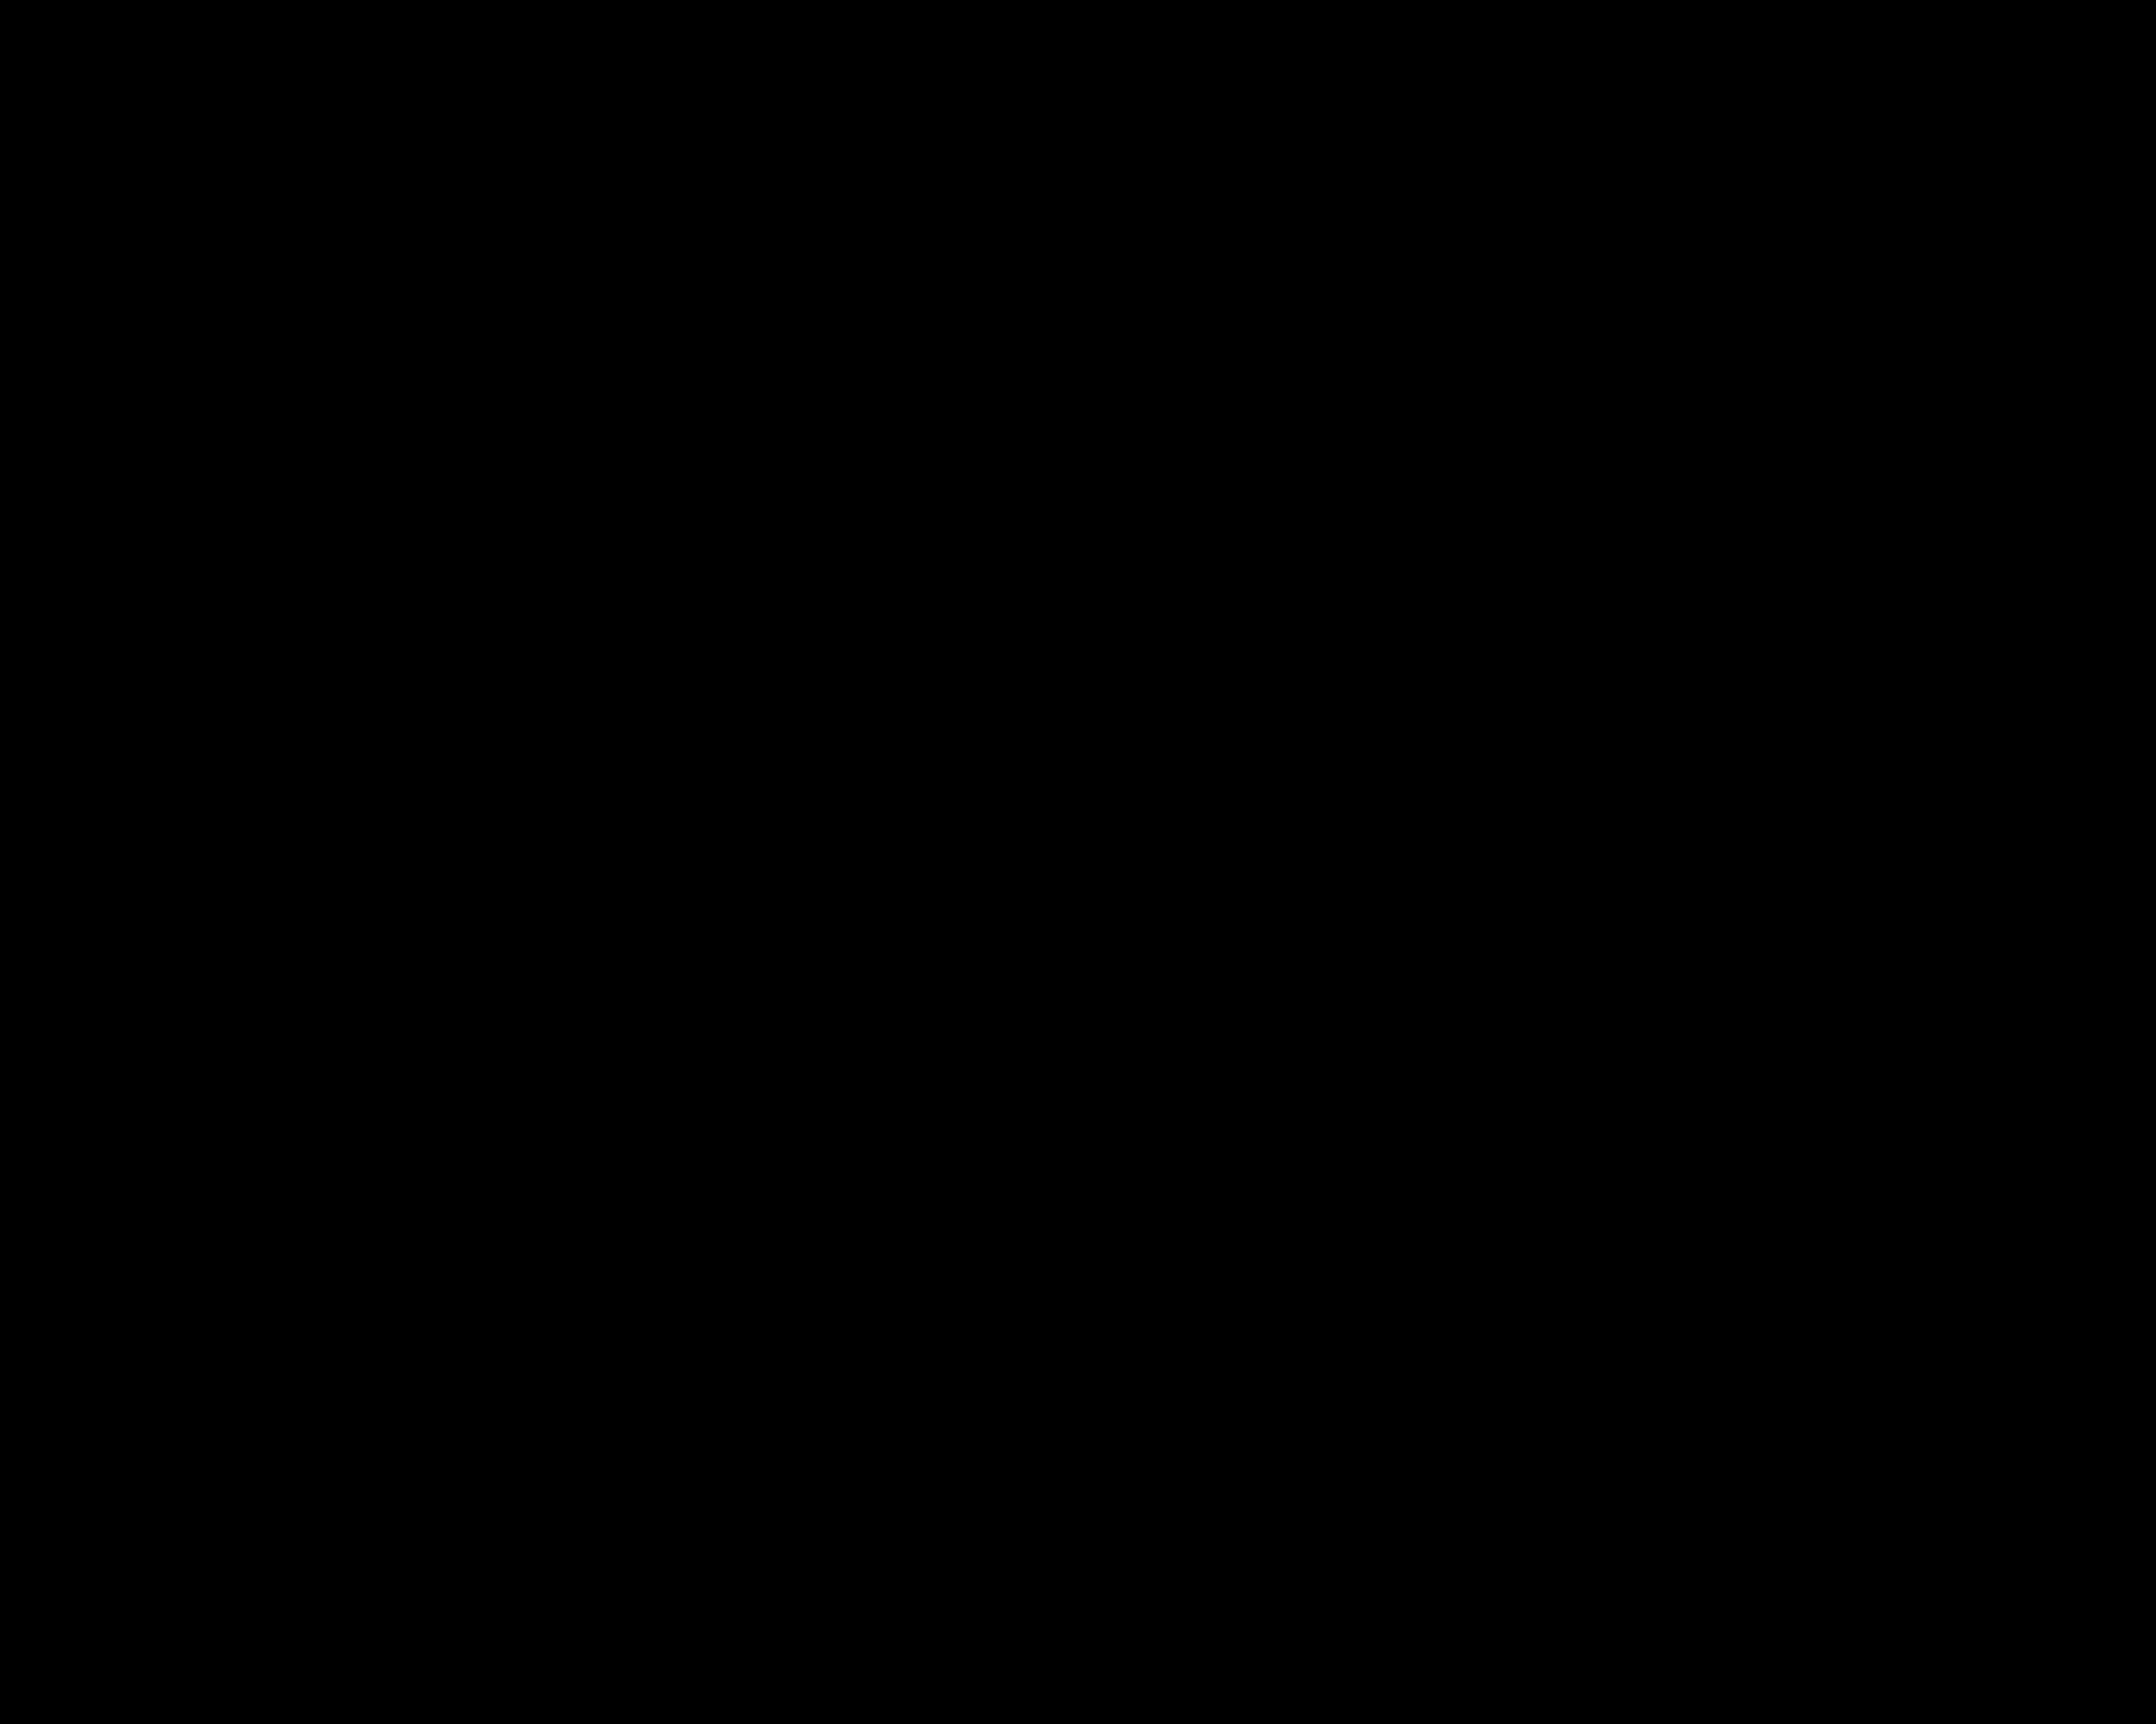 Atom clipart black and white.